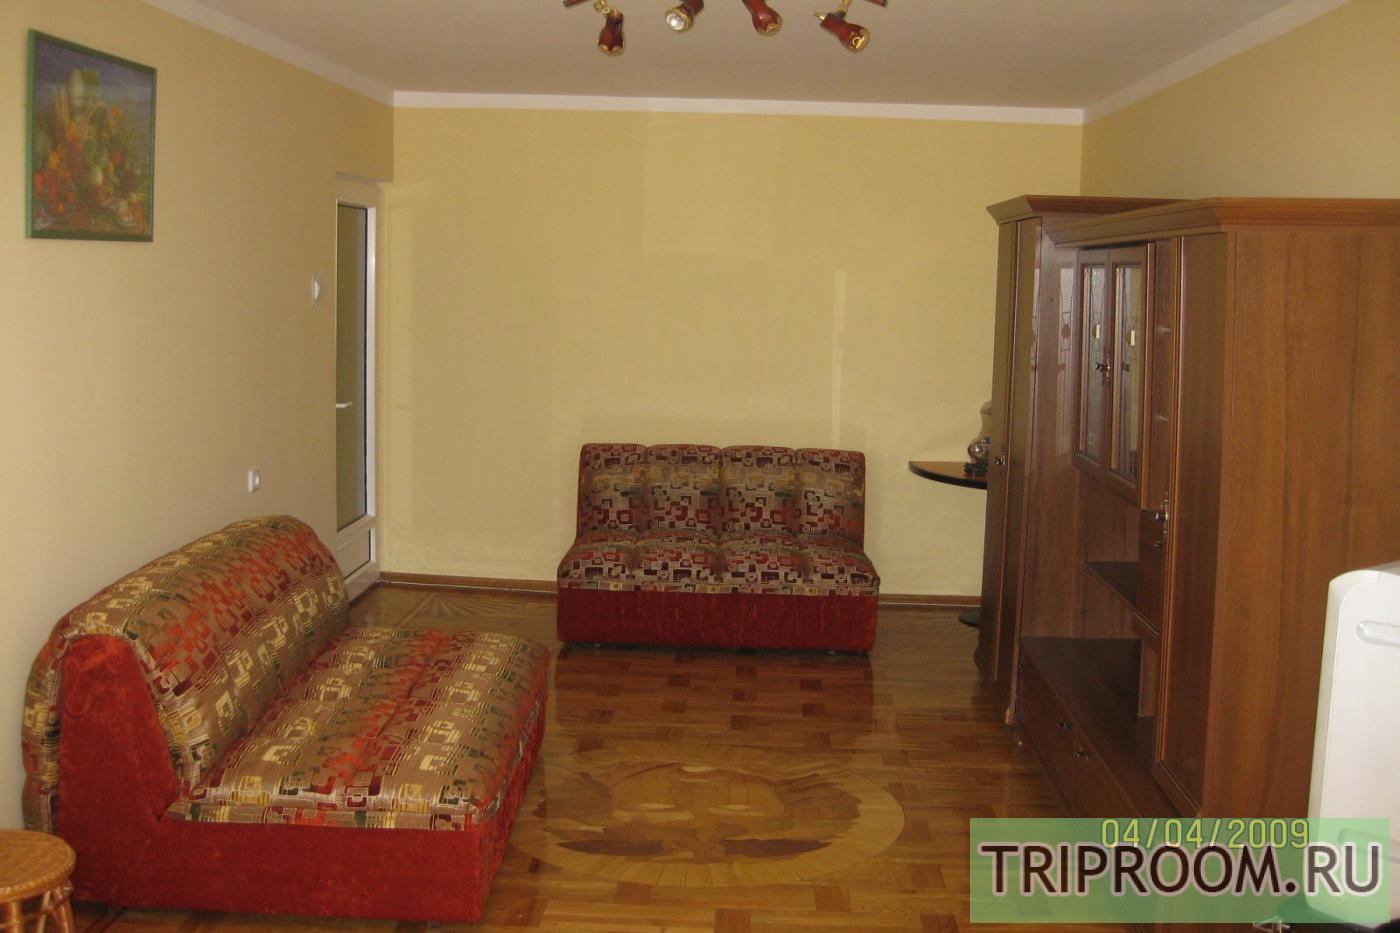 3-комнатная квартира посуточно (вариант № 19279), ул. Свердлова улица, фото № 1